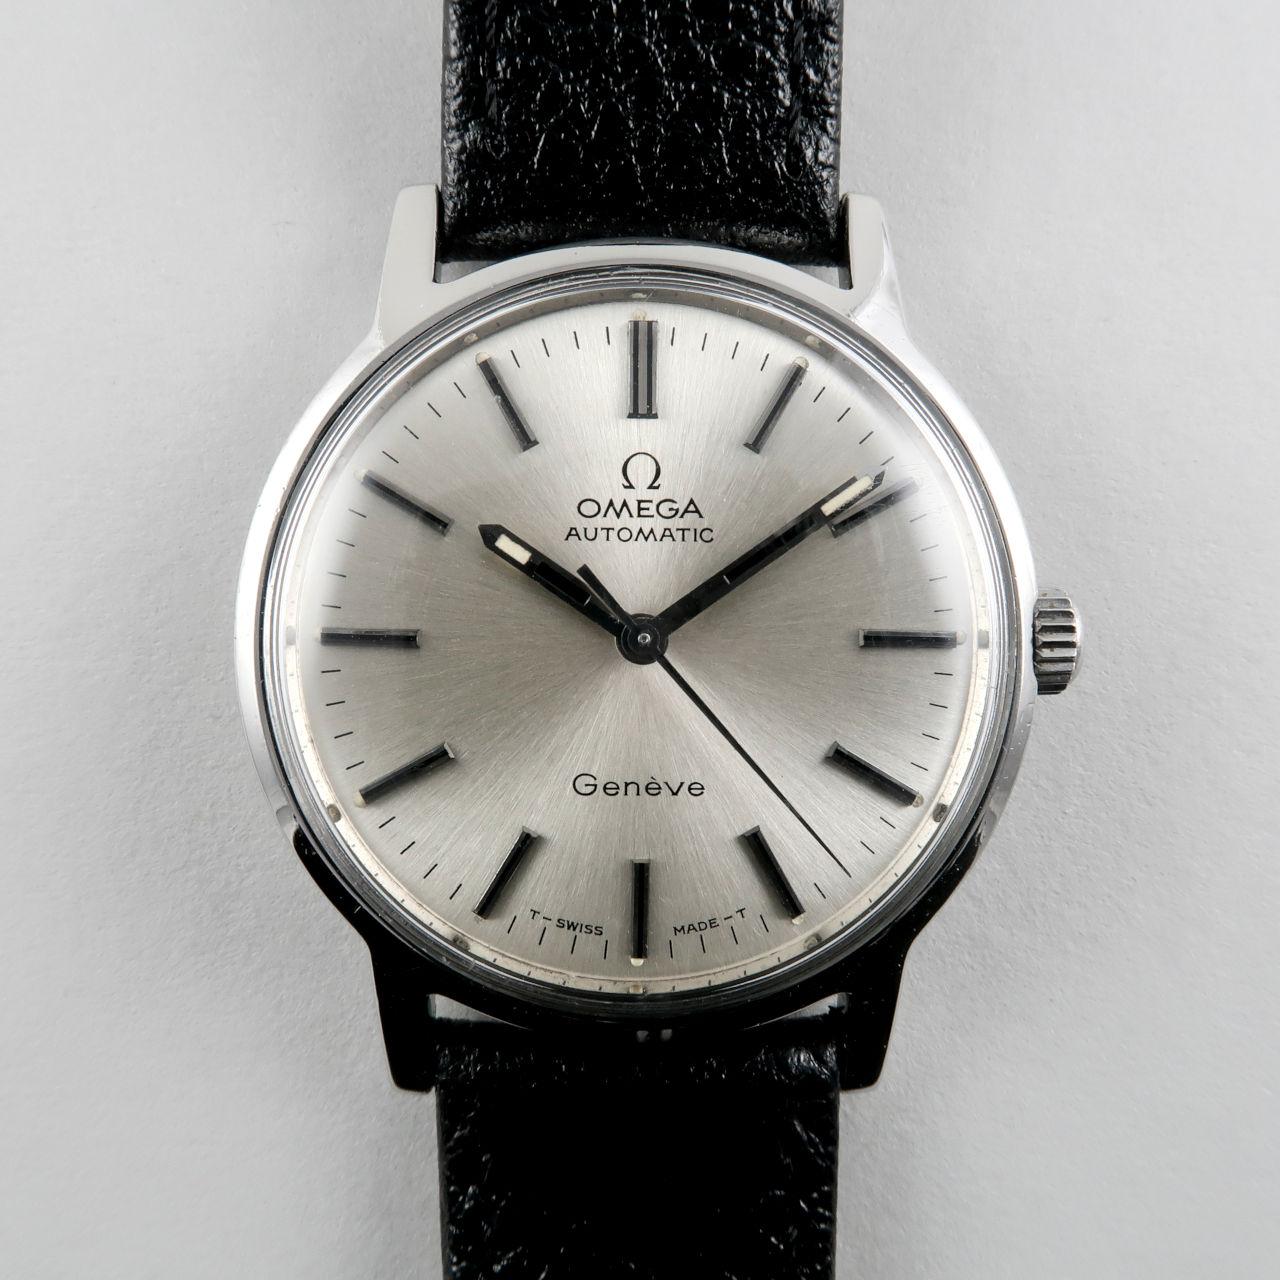 Omega Genève Ref. 165.070 circa 1971 | steel automatic vintage wristwatch